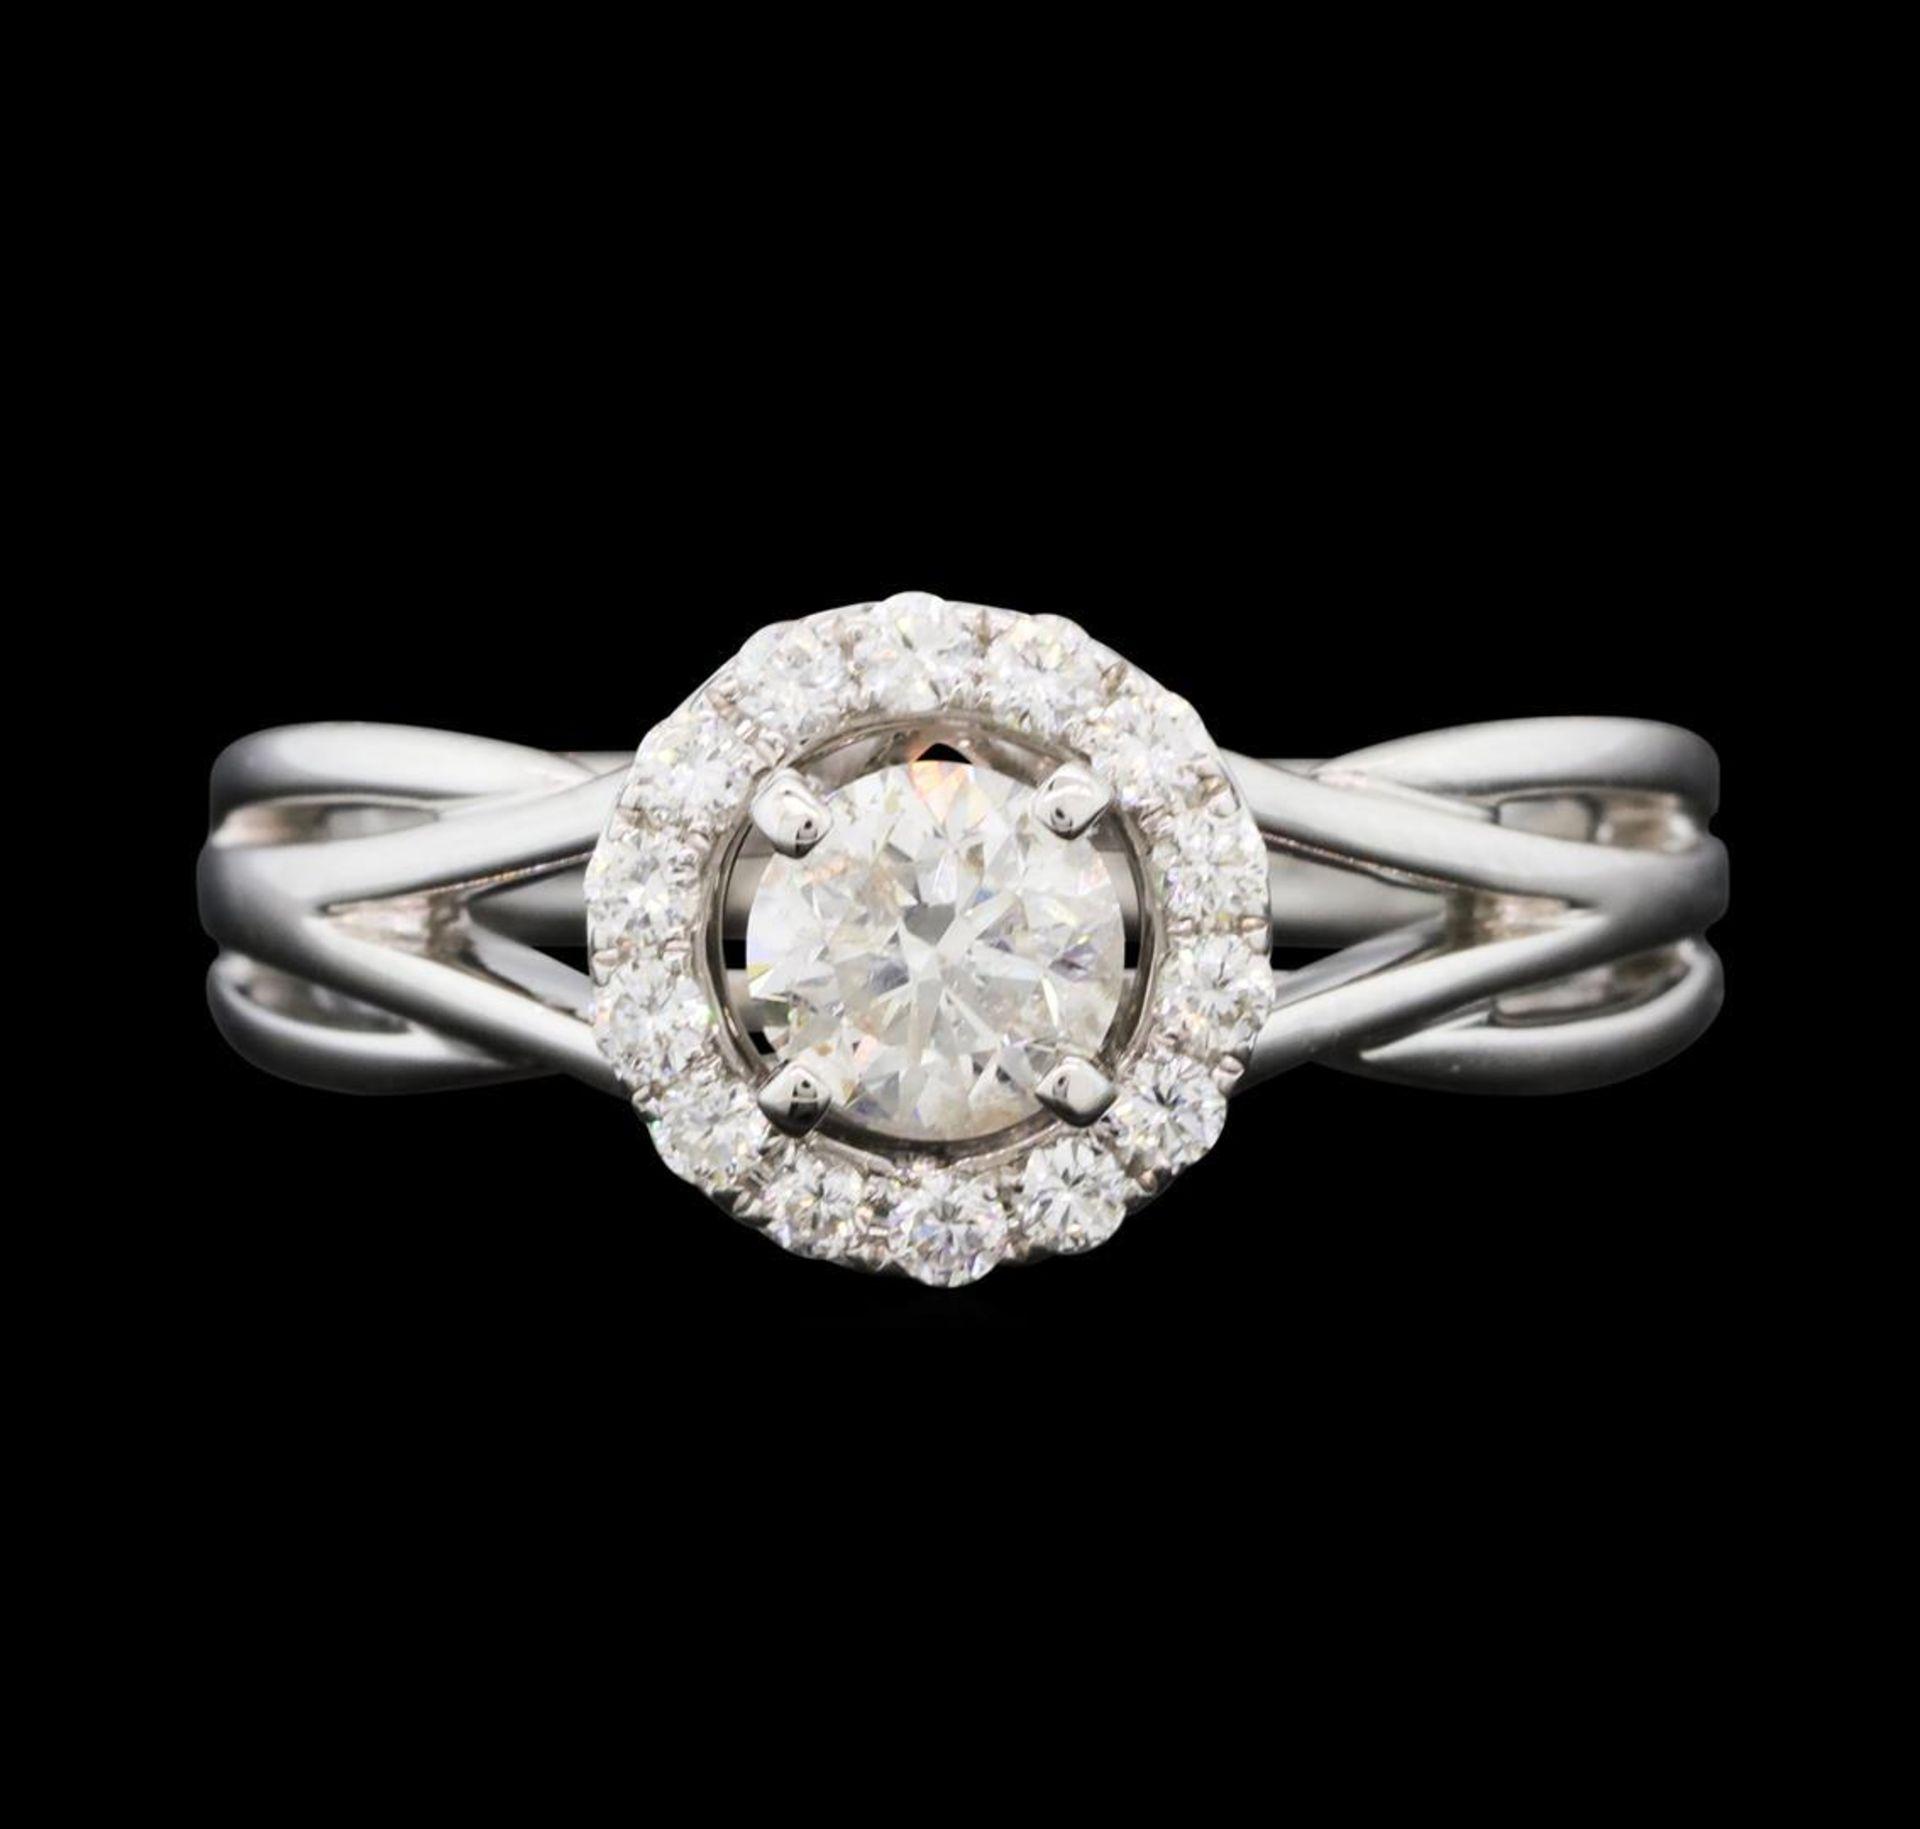 0.74 ctw Diamond Ring - 14KT White Gold - Image 2 of 5